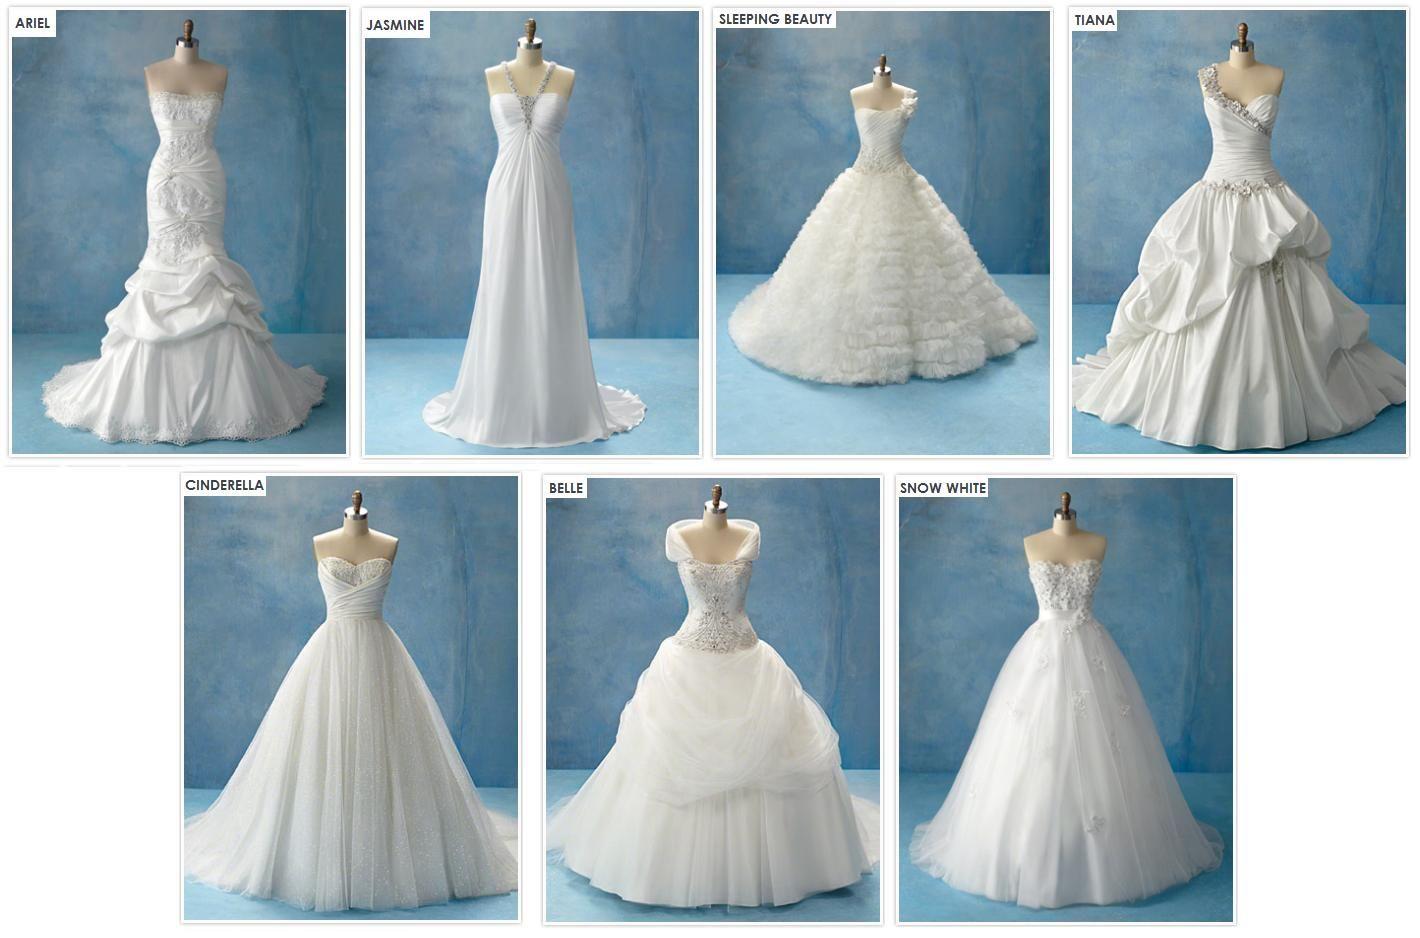 Disney Have Teamed Up With Designer Alfred Angelo To Create Disney Fair Disney Princess Wedding Dresses Disney Inspired Wedding Dresses Disney Wedding Dresses [ 938 x 1420 Pixel ]